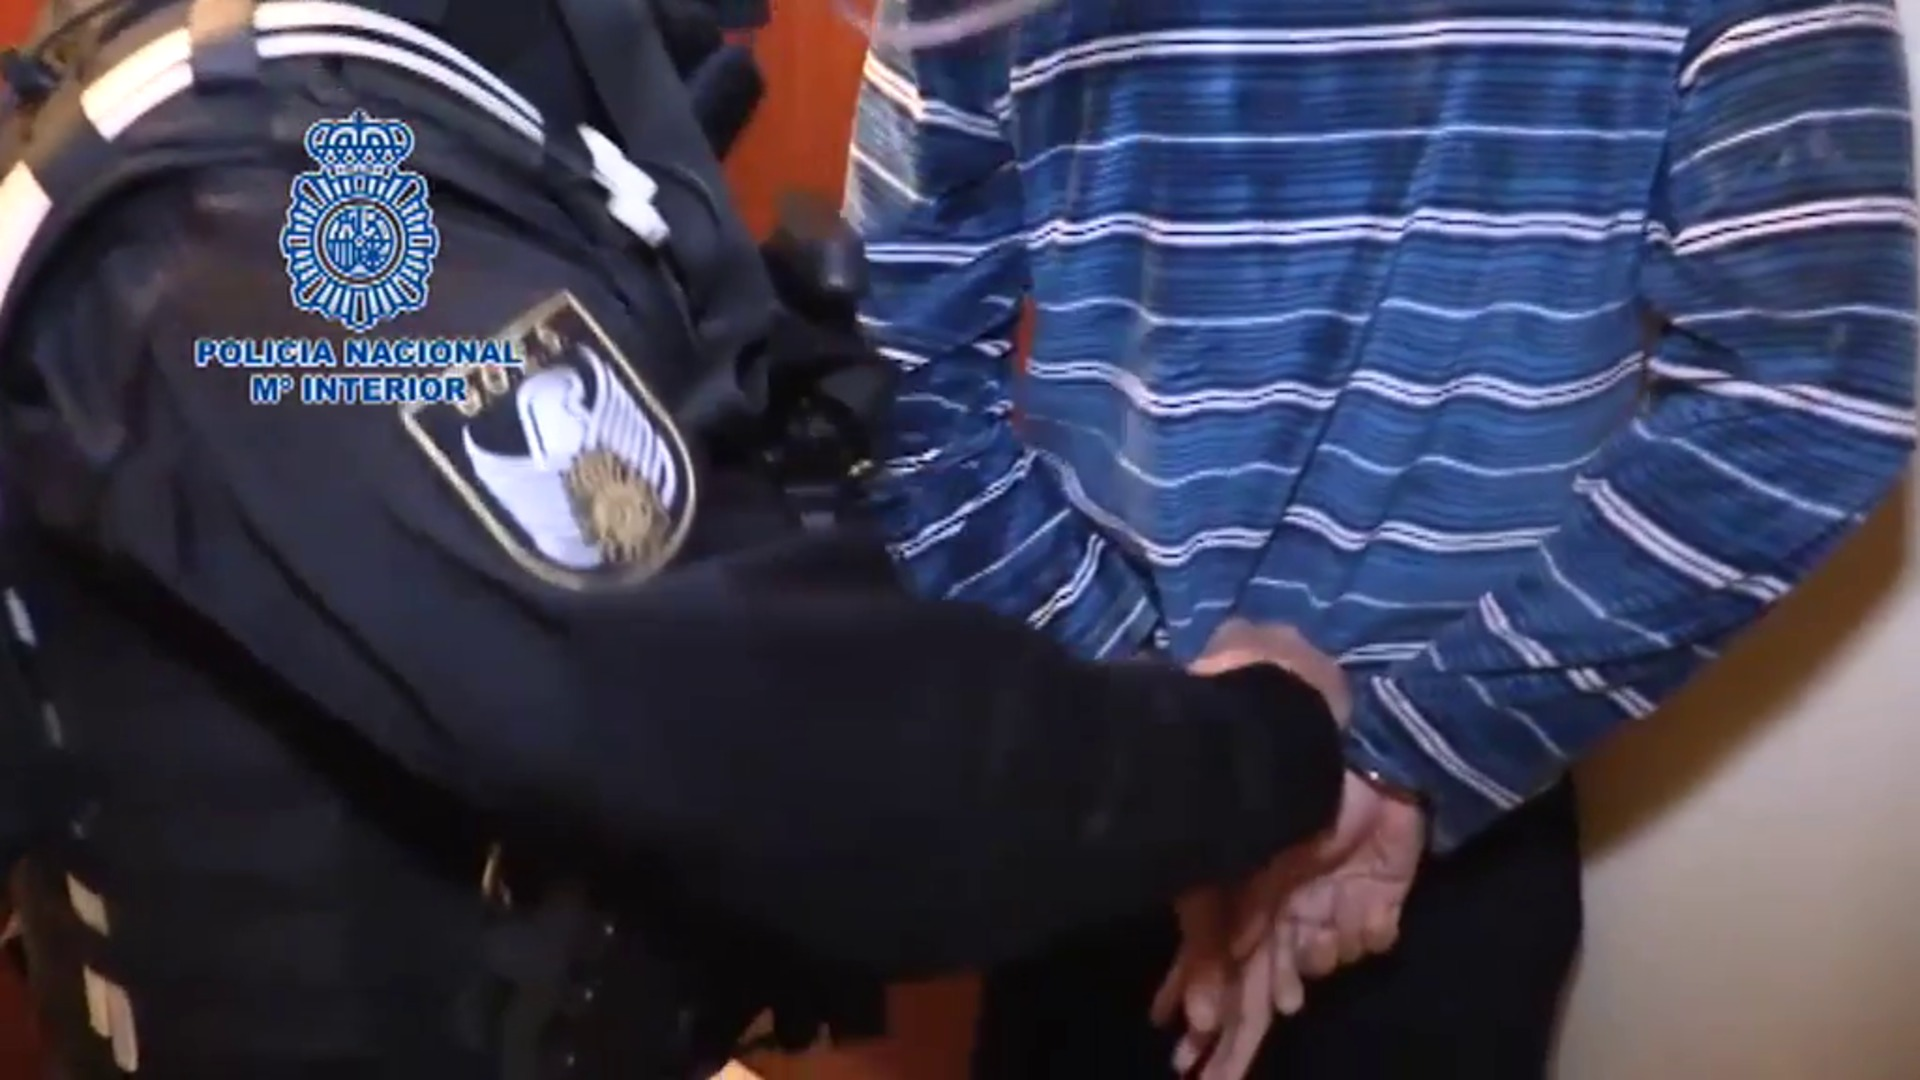 16 detenidos en Mallorca del grupo neonazi United Tribuns